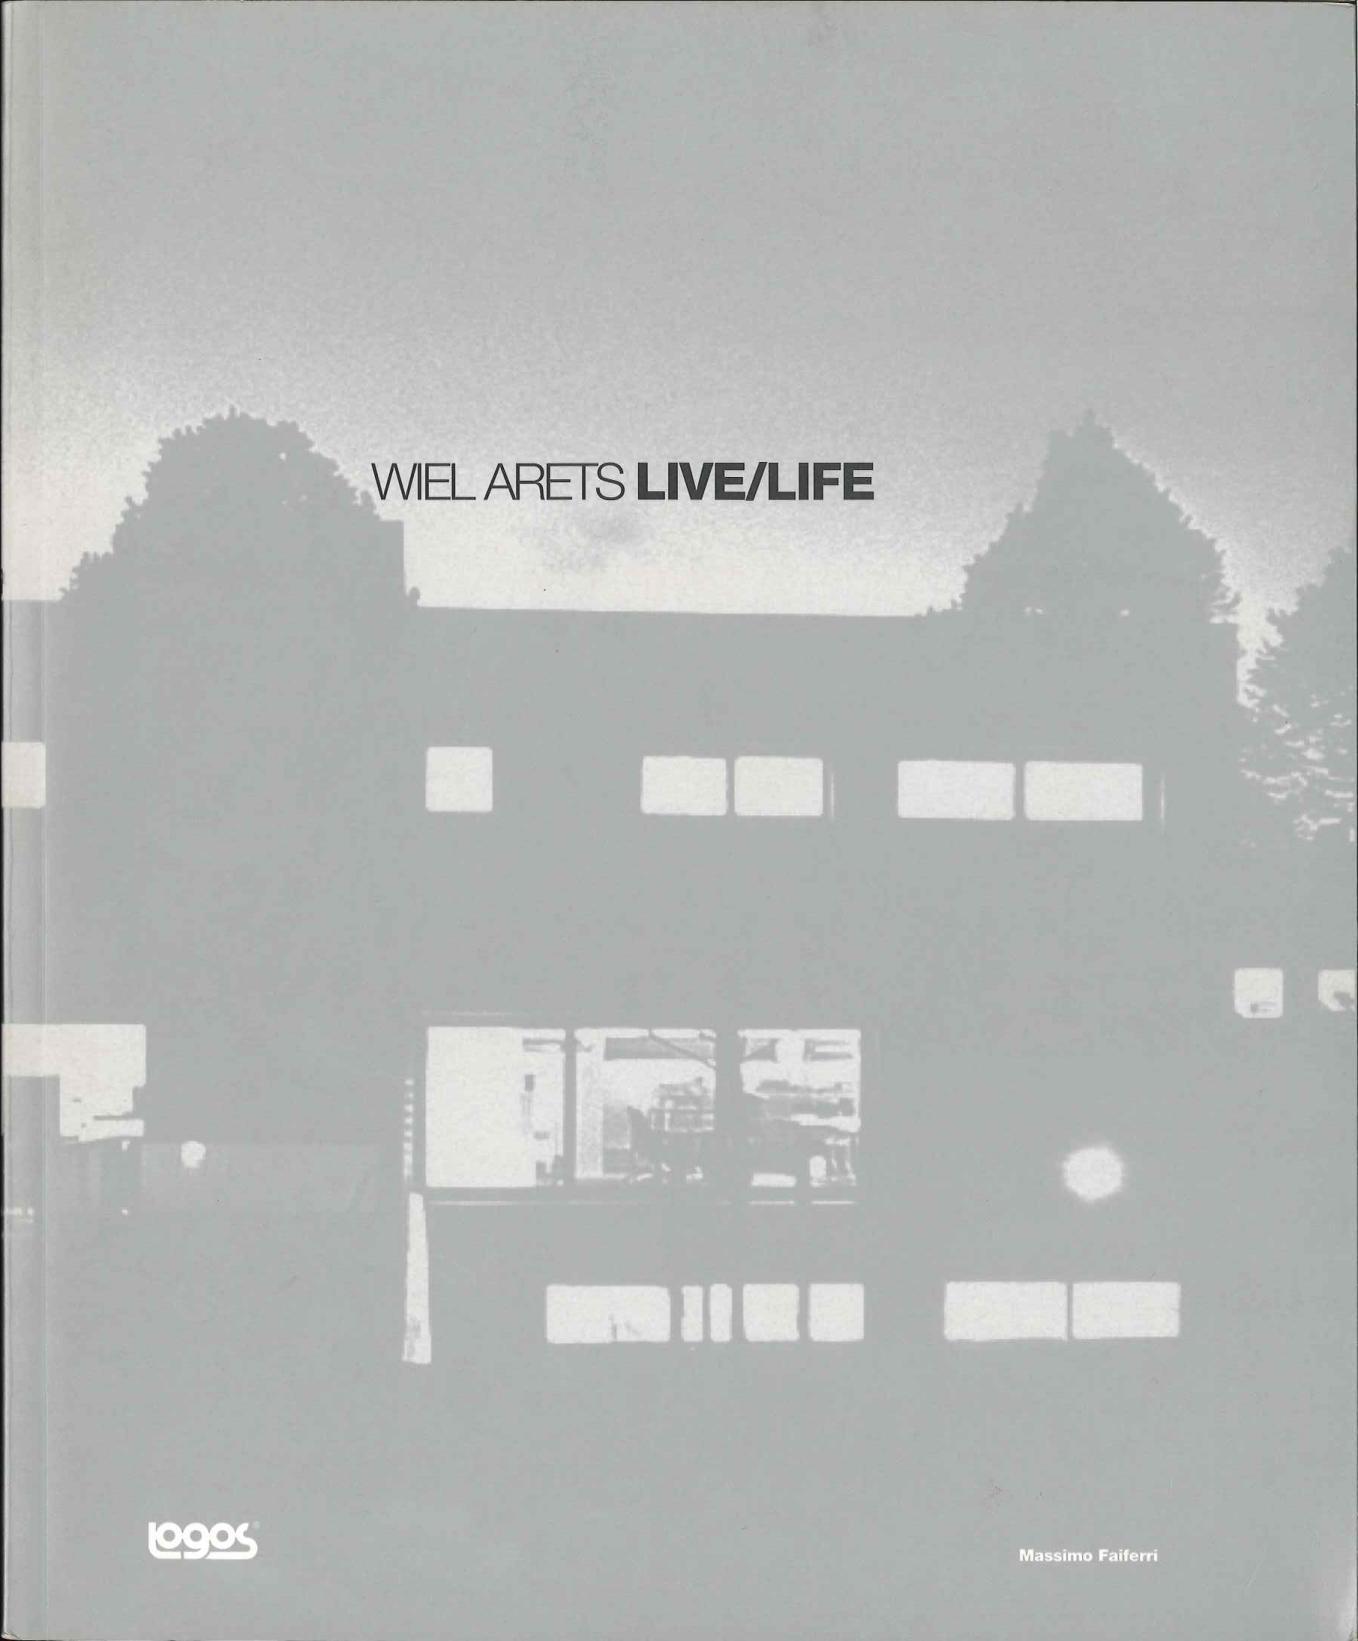 WIEL ARETS LIVE/LIFE